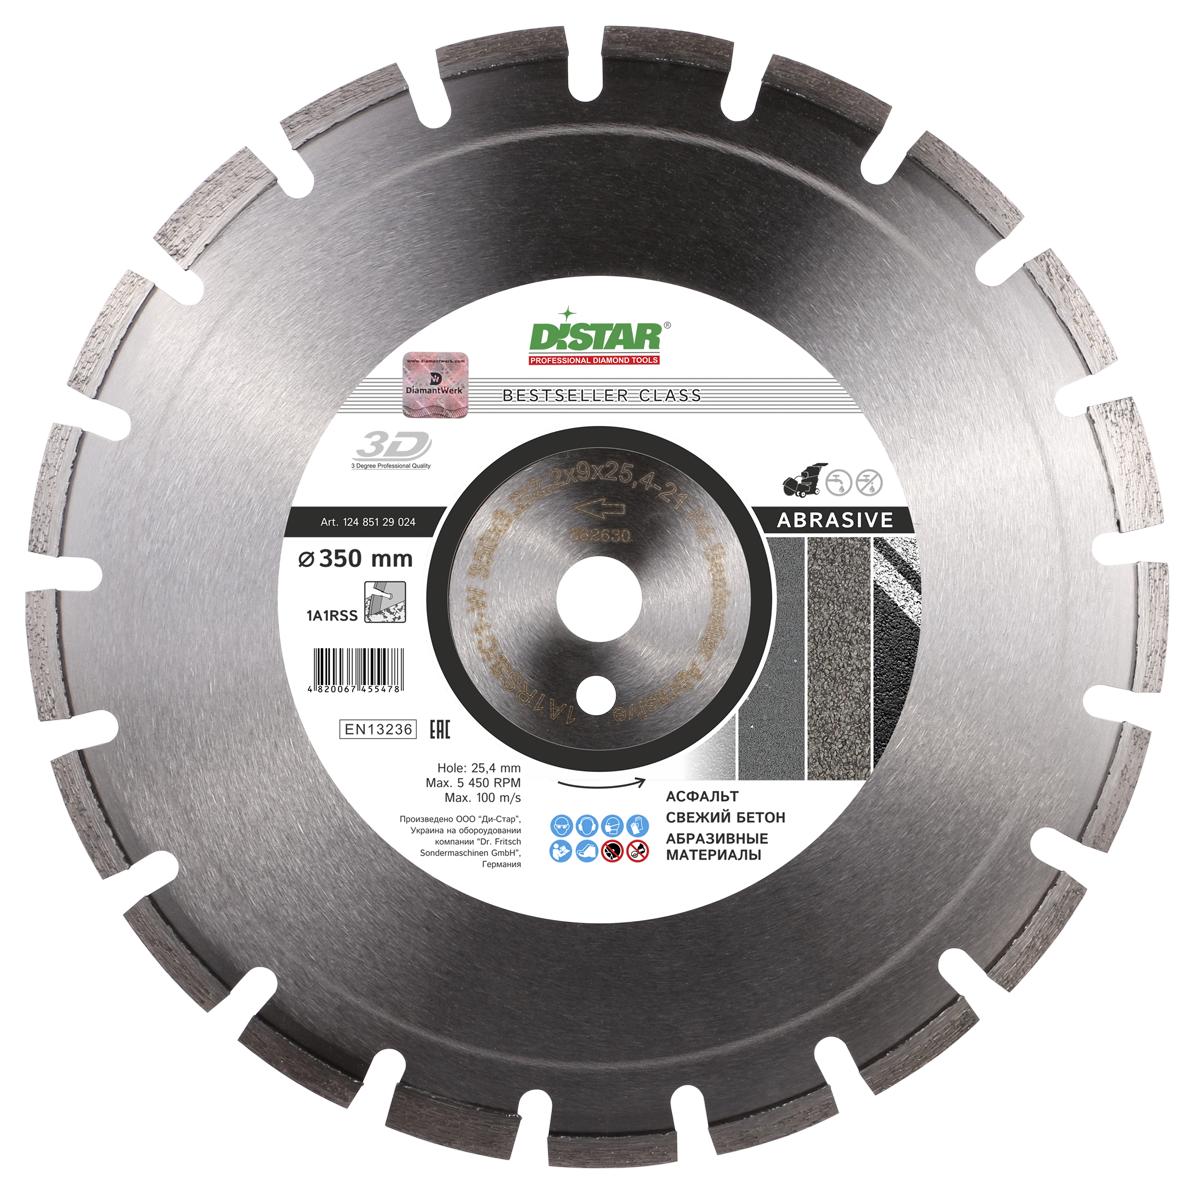 Круг алмазный отрезной Distar 1A1RSS/C1-W 350x3,2/2,2x9x25,4-21 F4 Bestseller Abrasive